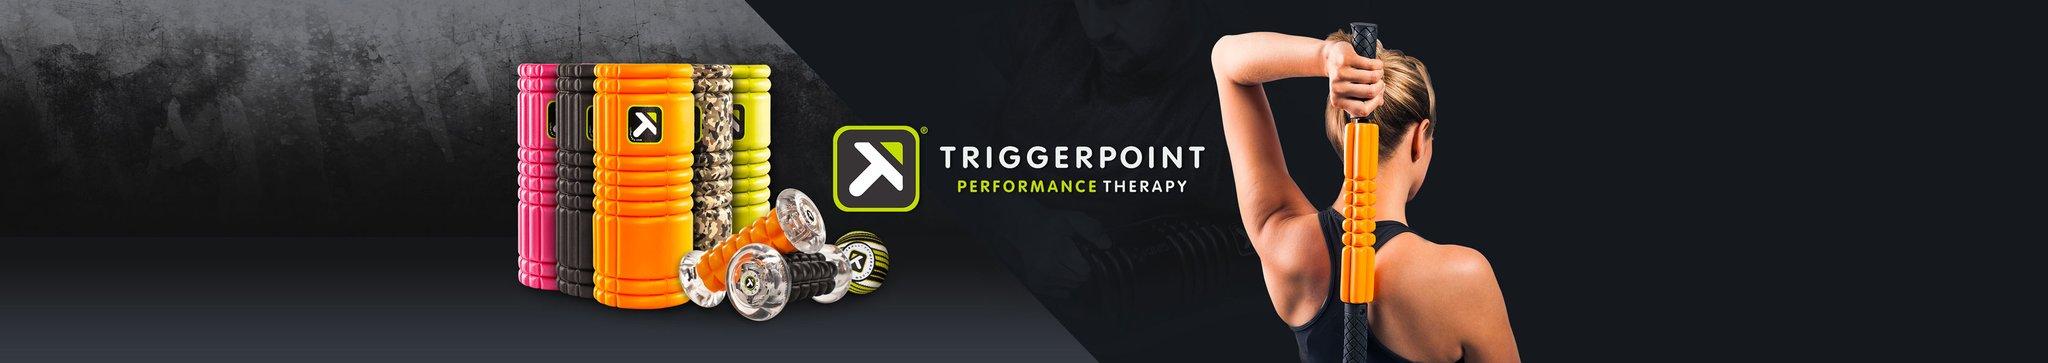 Triggerpoint-Banner-Cat-page-desktop_2048x2048.jpg